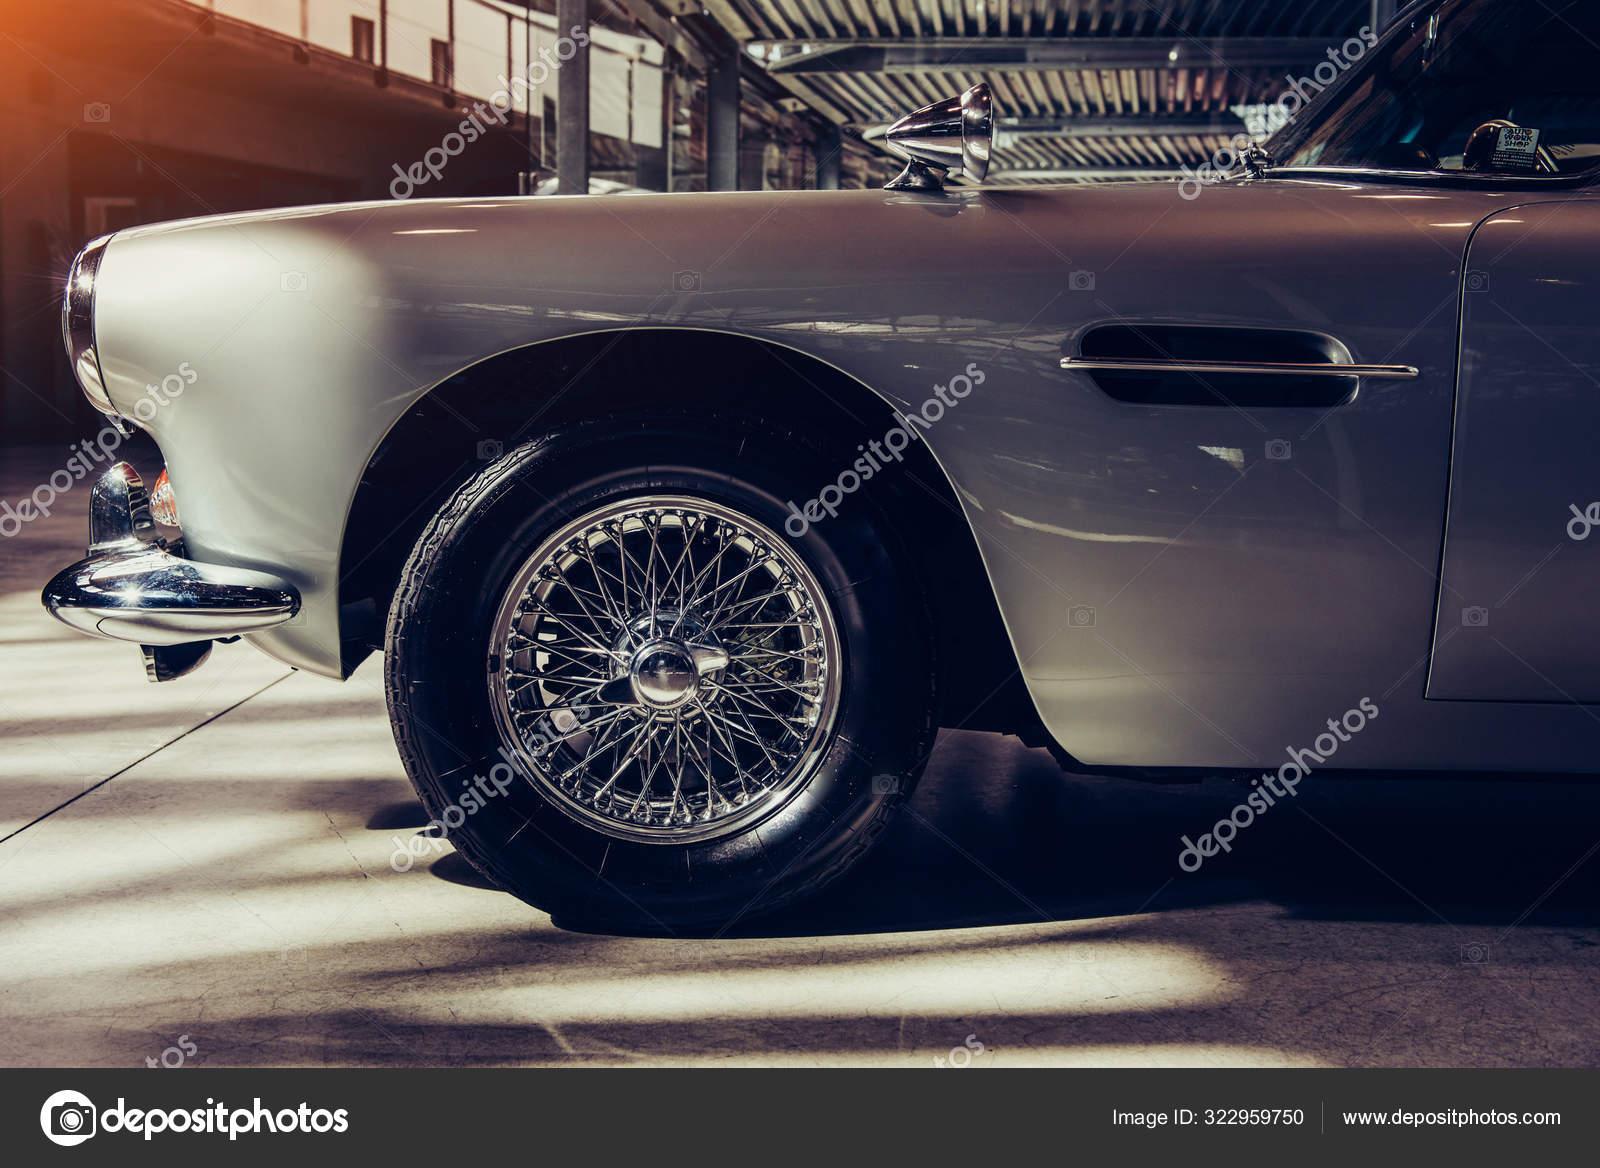 Vintage Transport Retro Car Exhibition Cars Stock Editorial Photo C Myronstandret 322959750